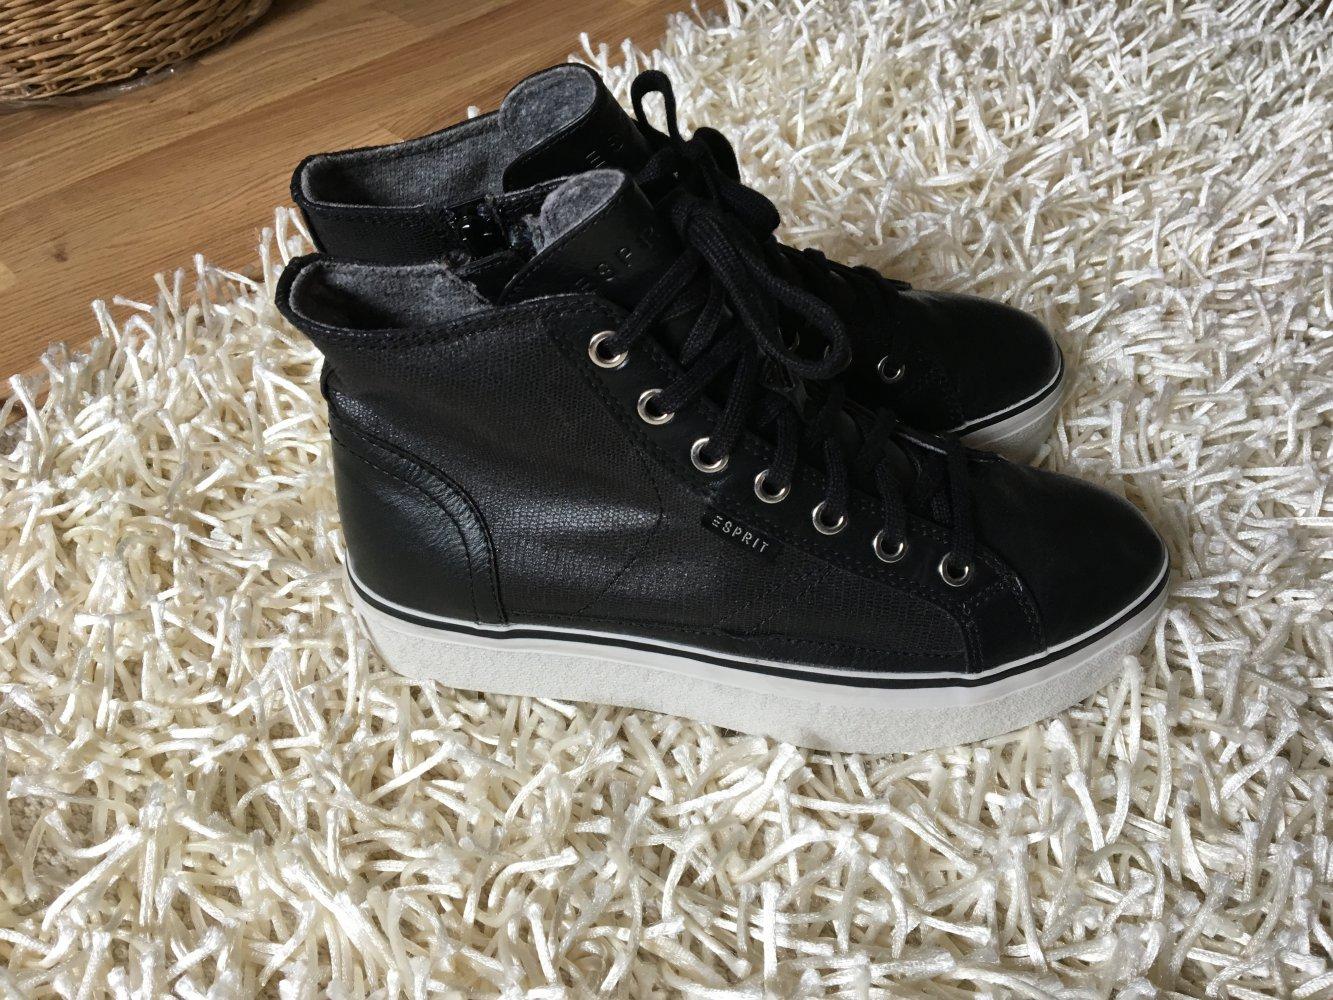 buy online 66b11 a8301 Edc Plateau Esprit Schuhe Schuhe Esprit Schwarz Edc O80PvwNnym